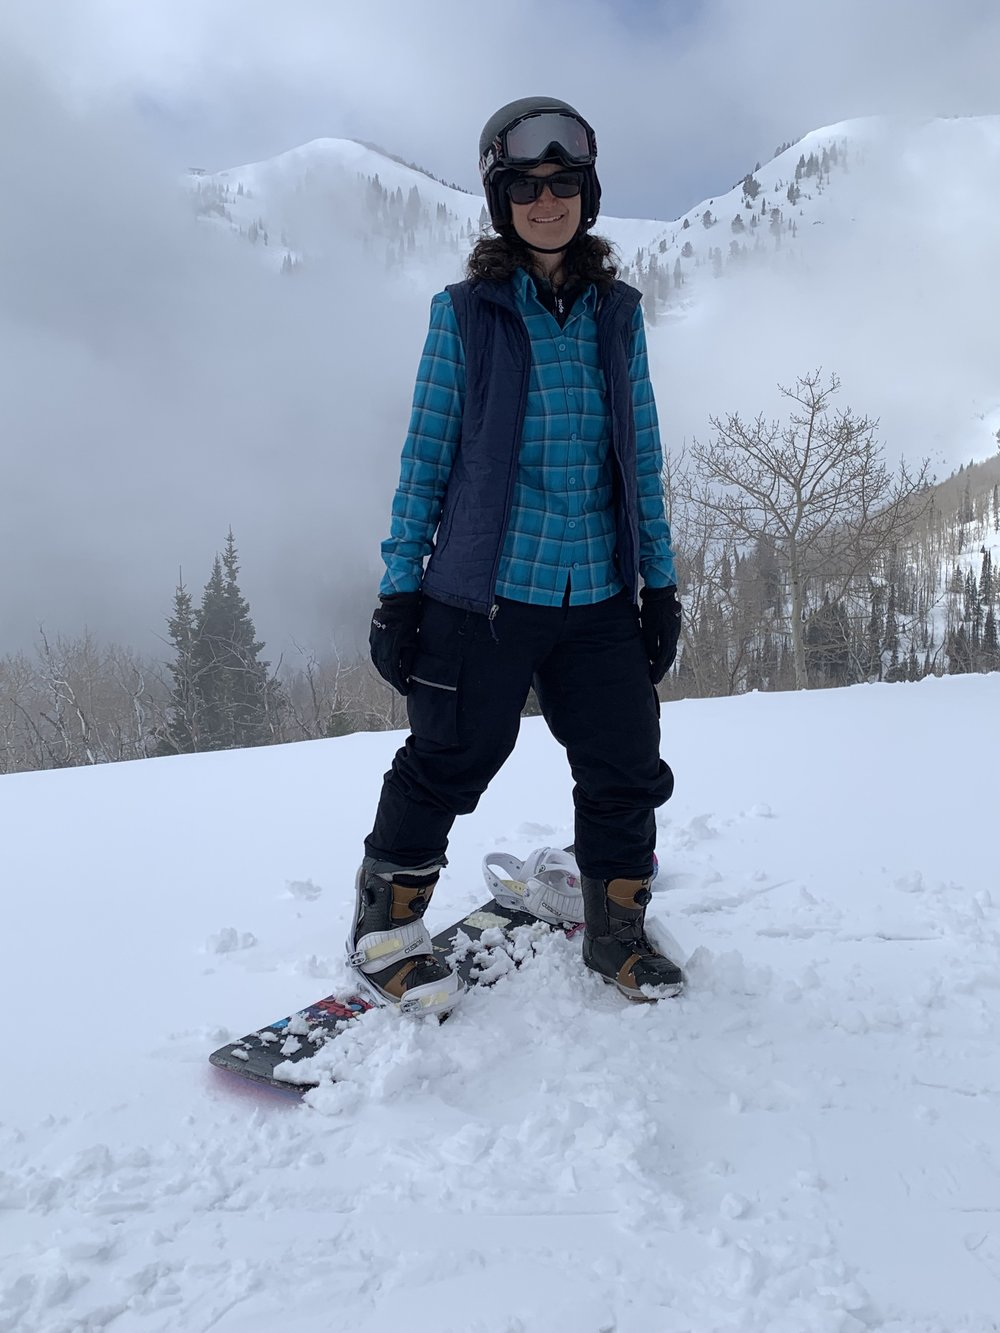 Laura on Snowboard_2_IMG_9493.jpeg